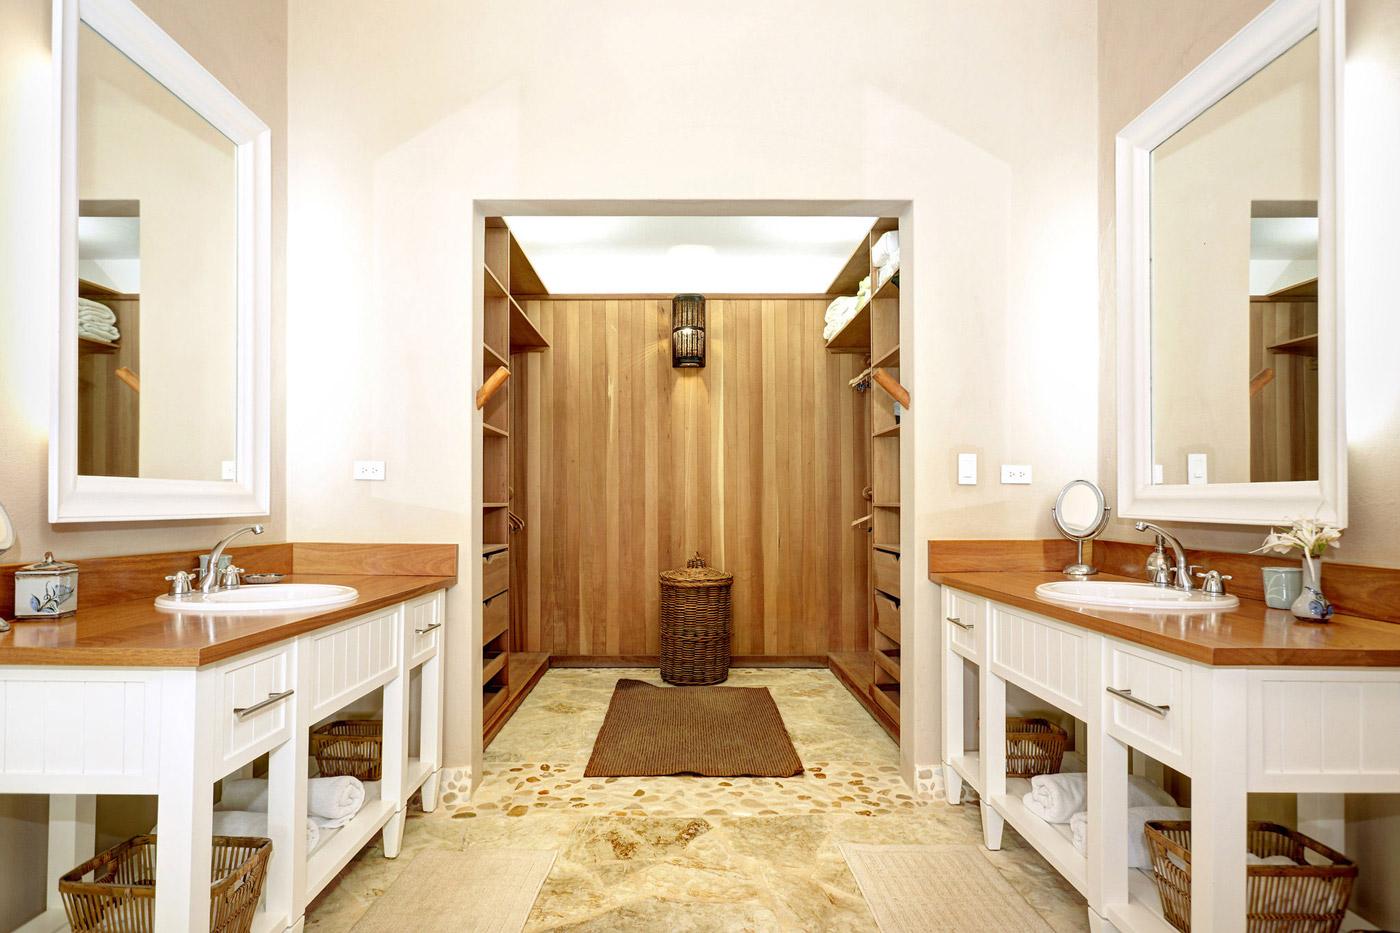 Double Sinks, Walk-in-Closet